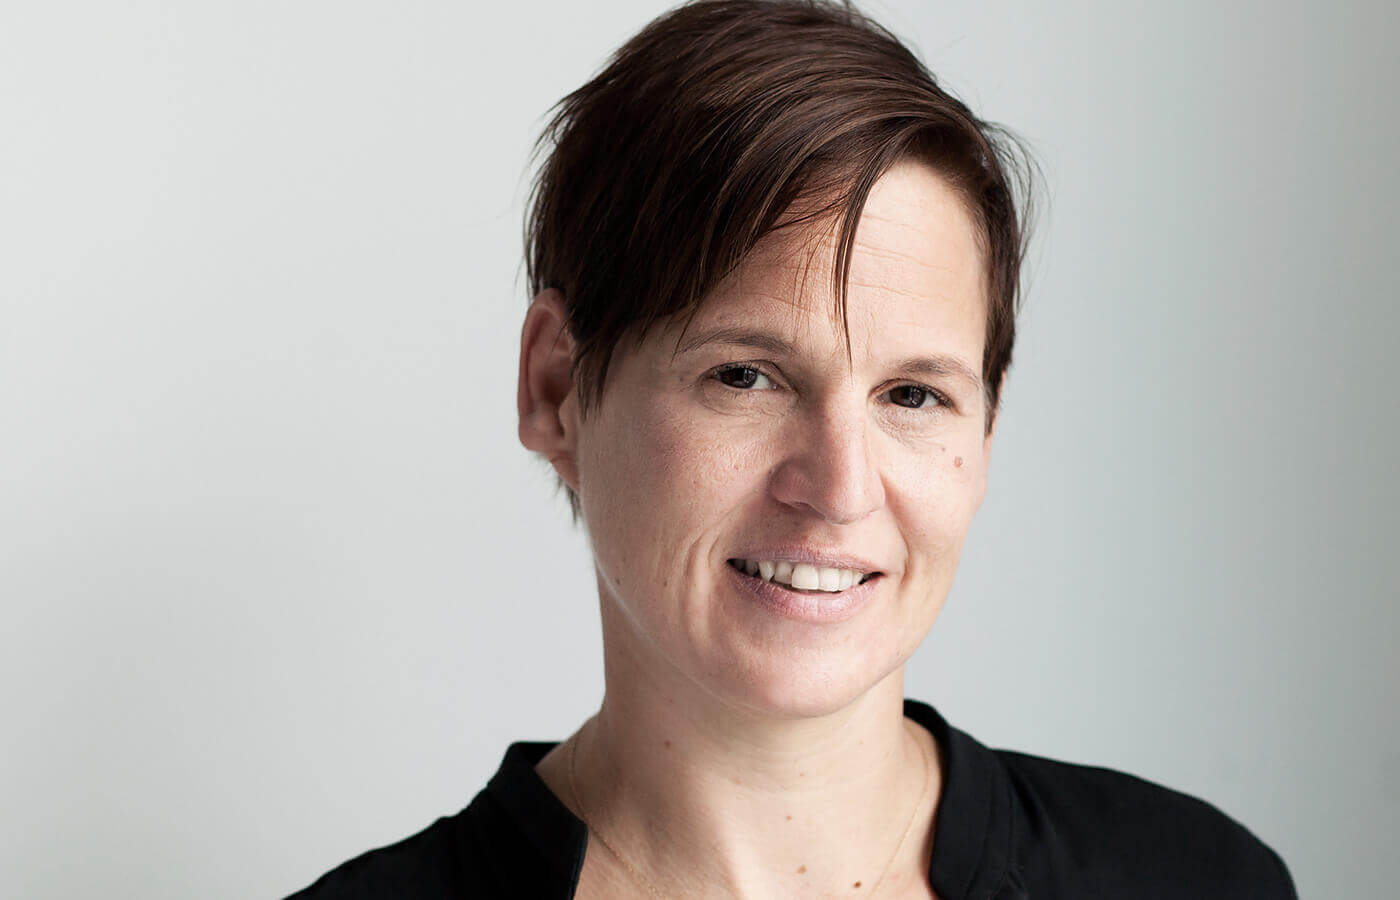 MAYR Arbeitsrecht – Steffi Mayr